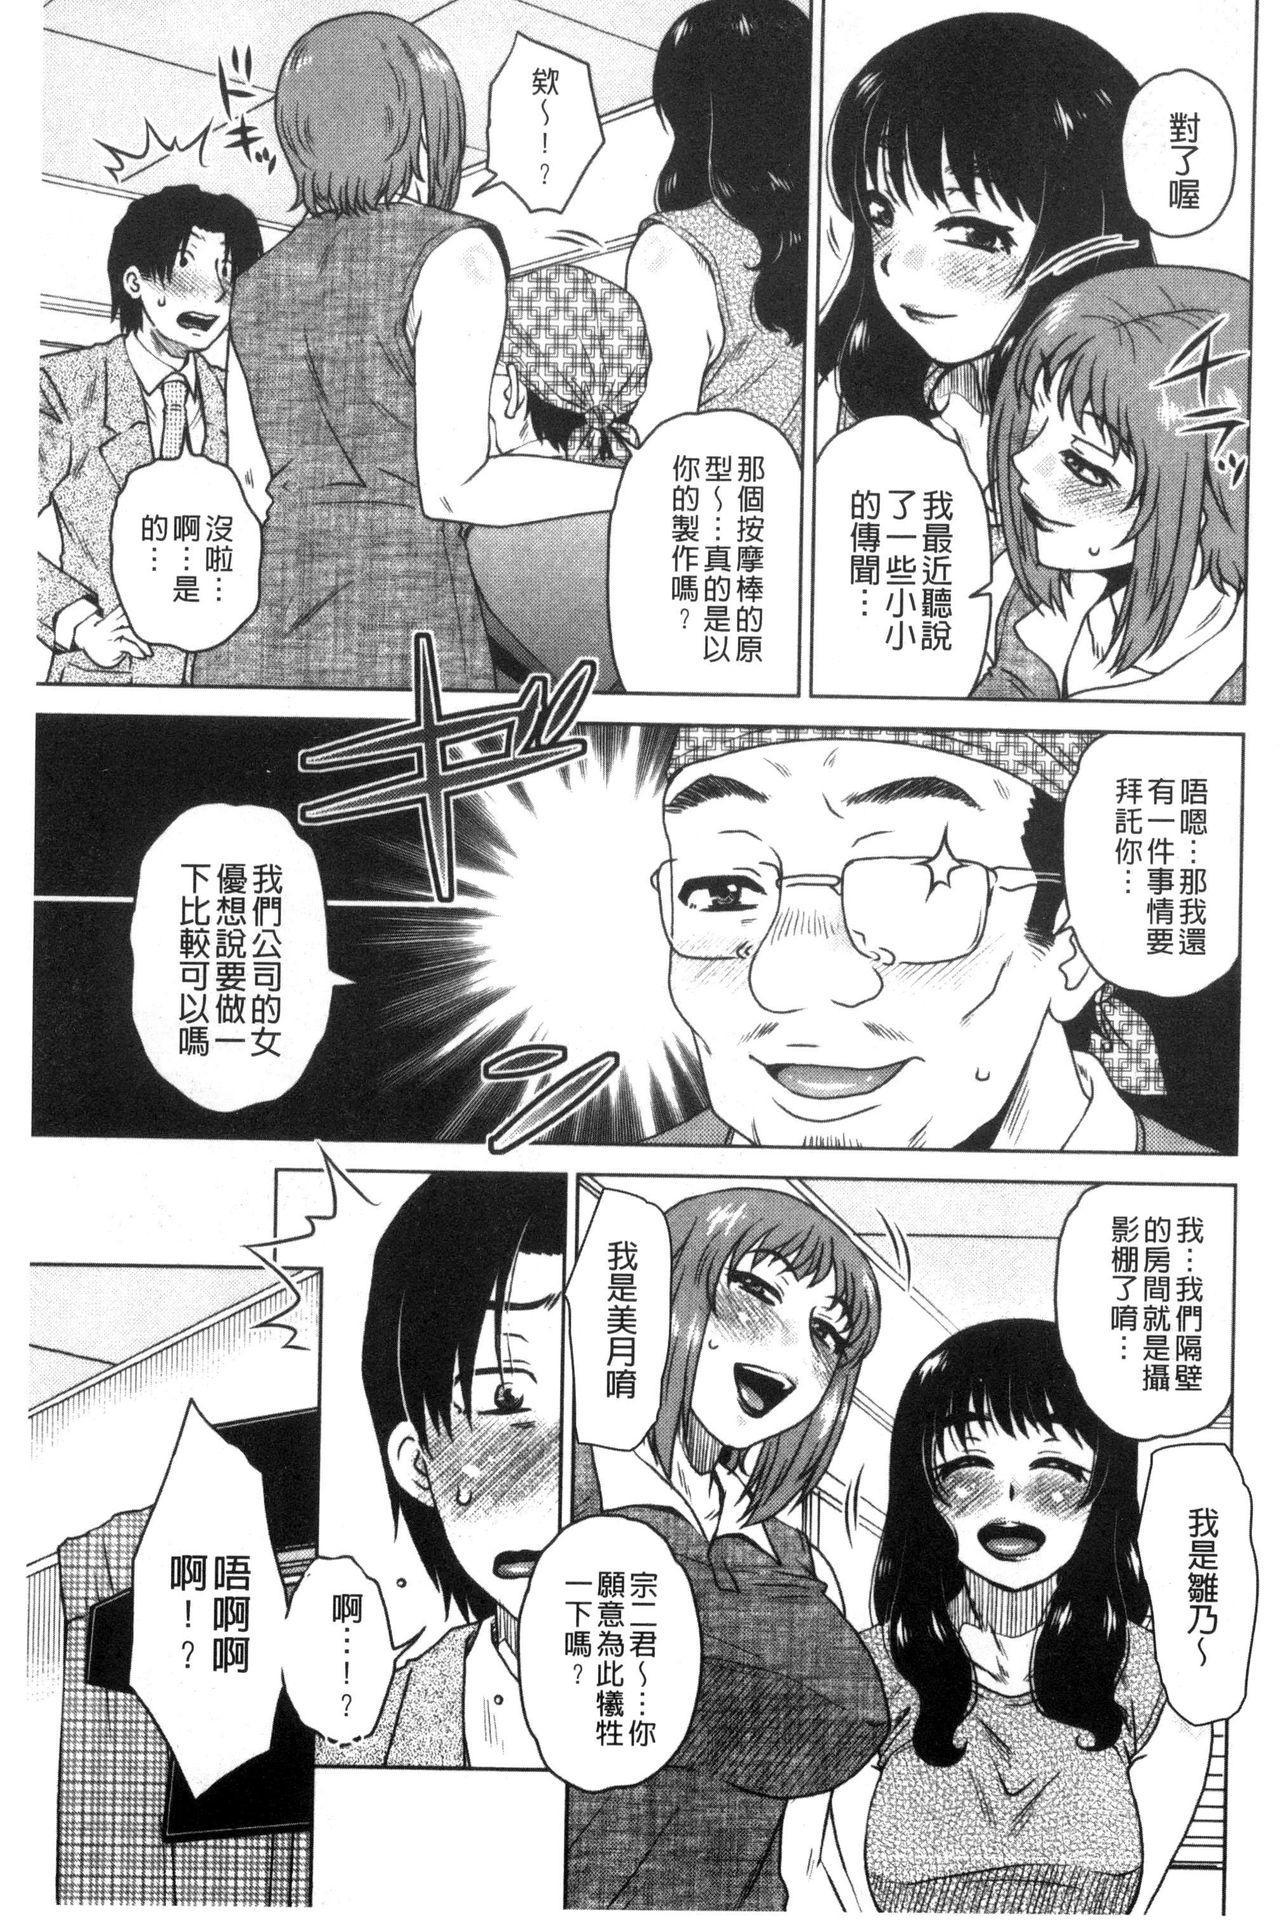 [Kurumiya Mashimin] Uchi no Shachou no Hamedere Inkatsu - Our President is HAME-DERE in Licentious sex life. [Chinese] 71